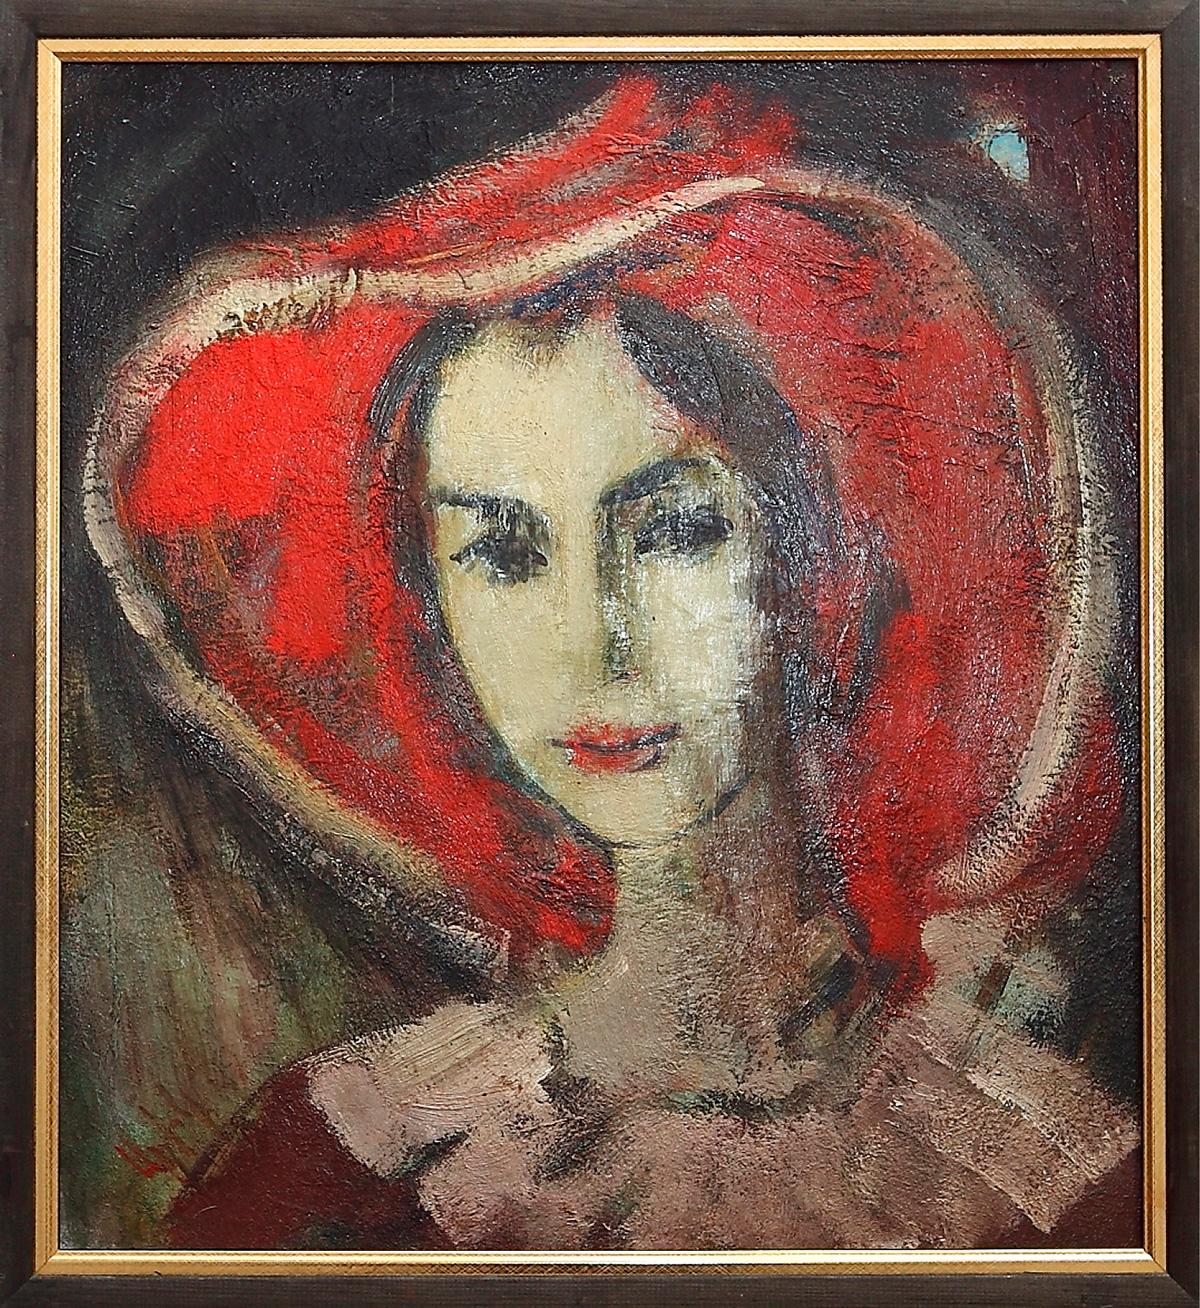 Наиры 2016 хм 3 - Naira's portrait, 55х55, oil on canvas, 2016